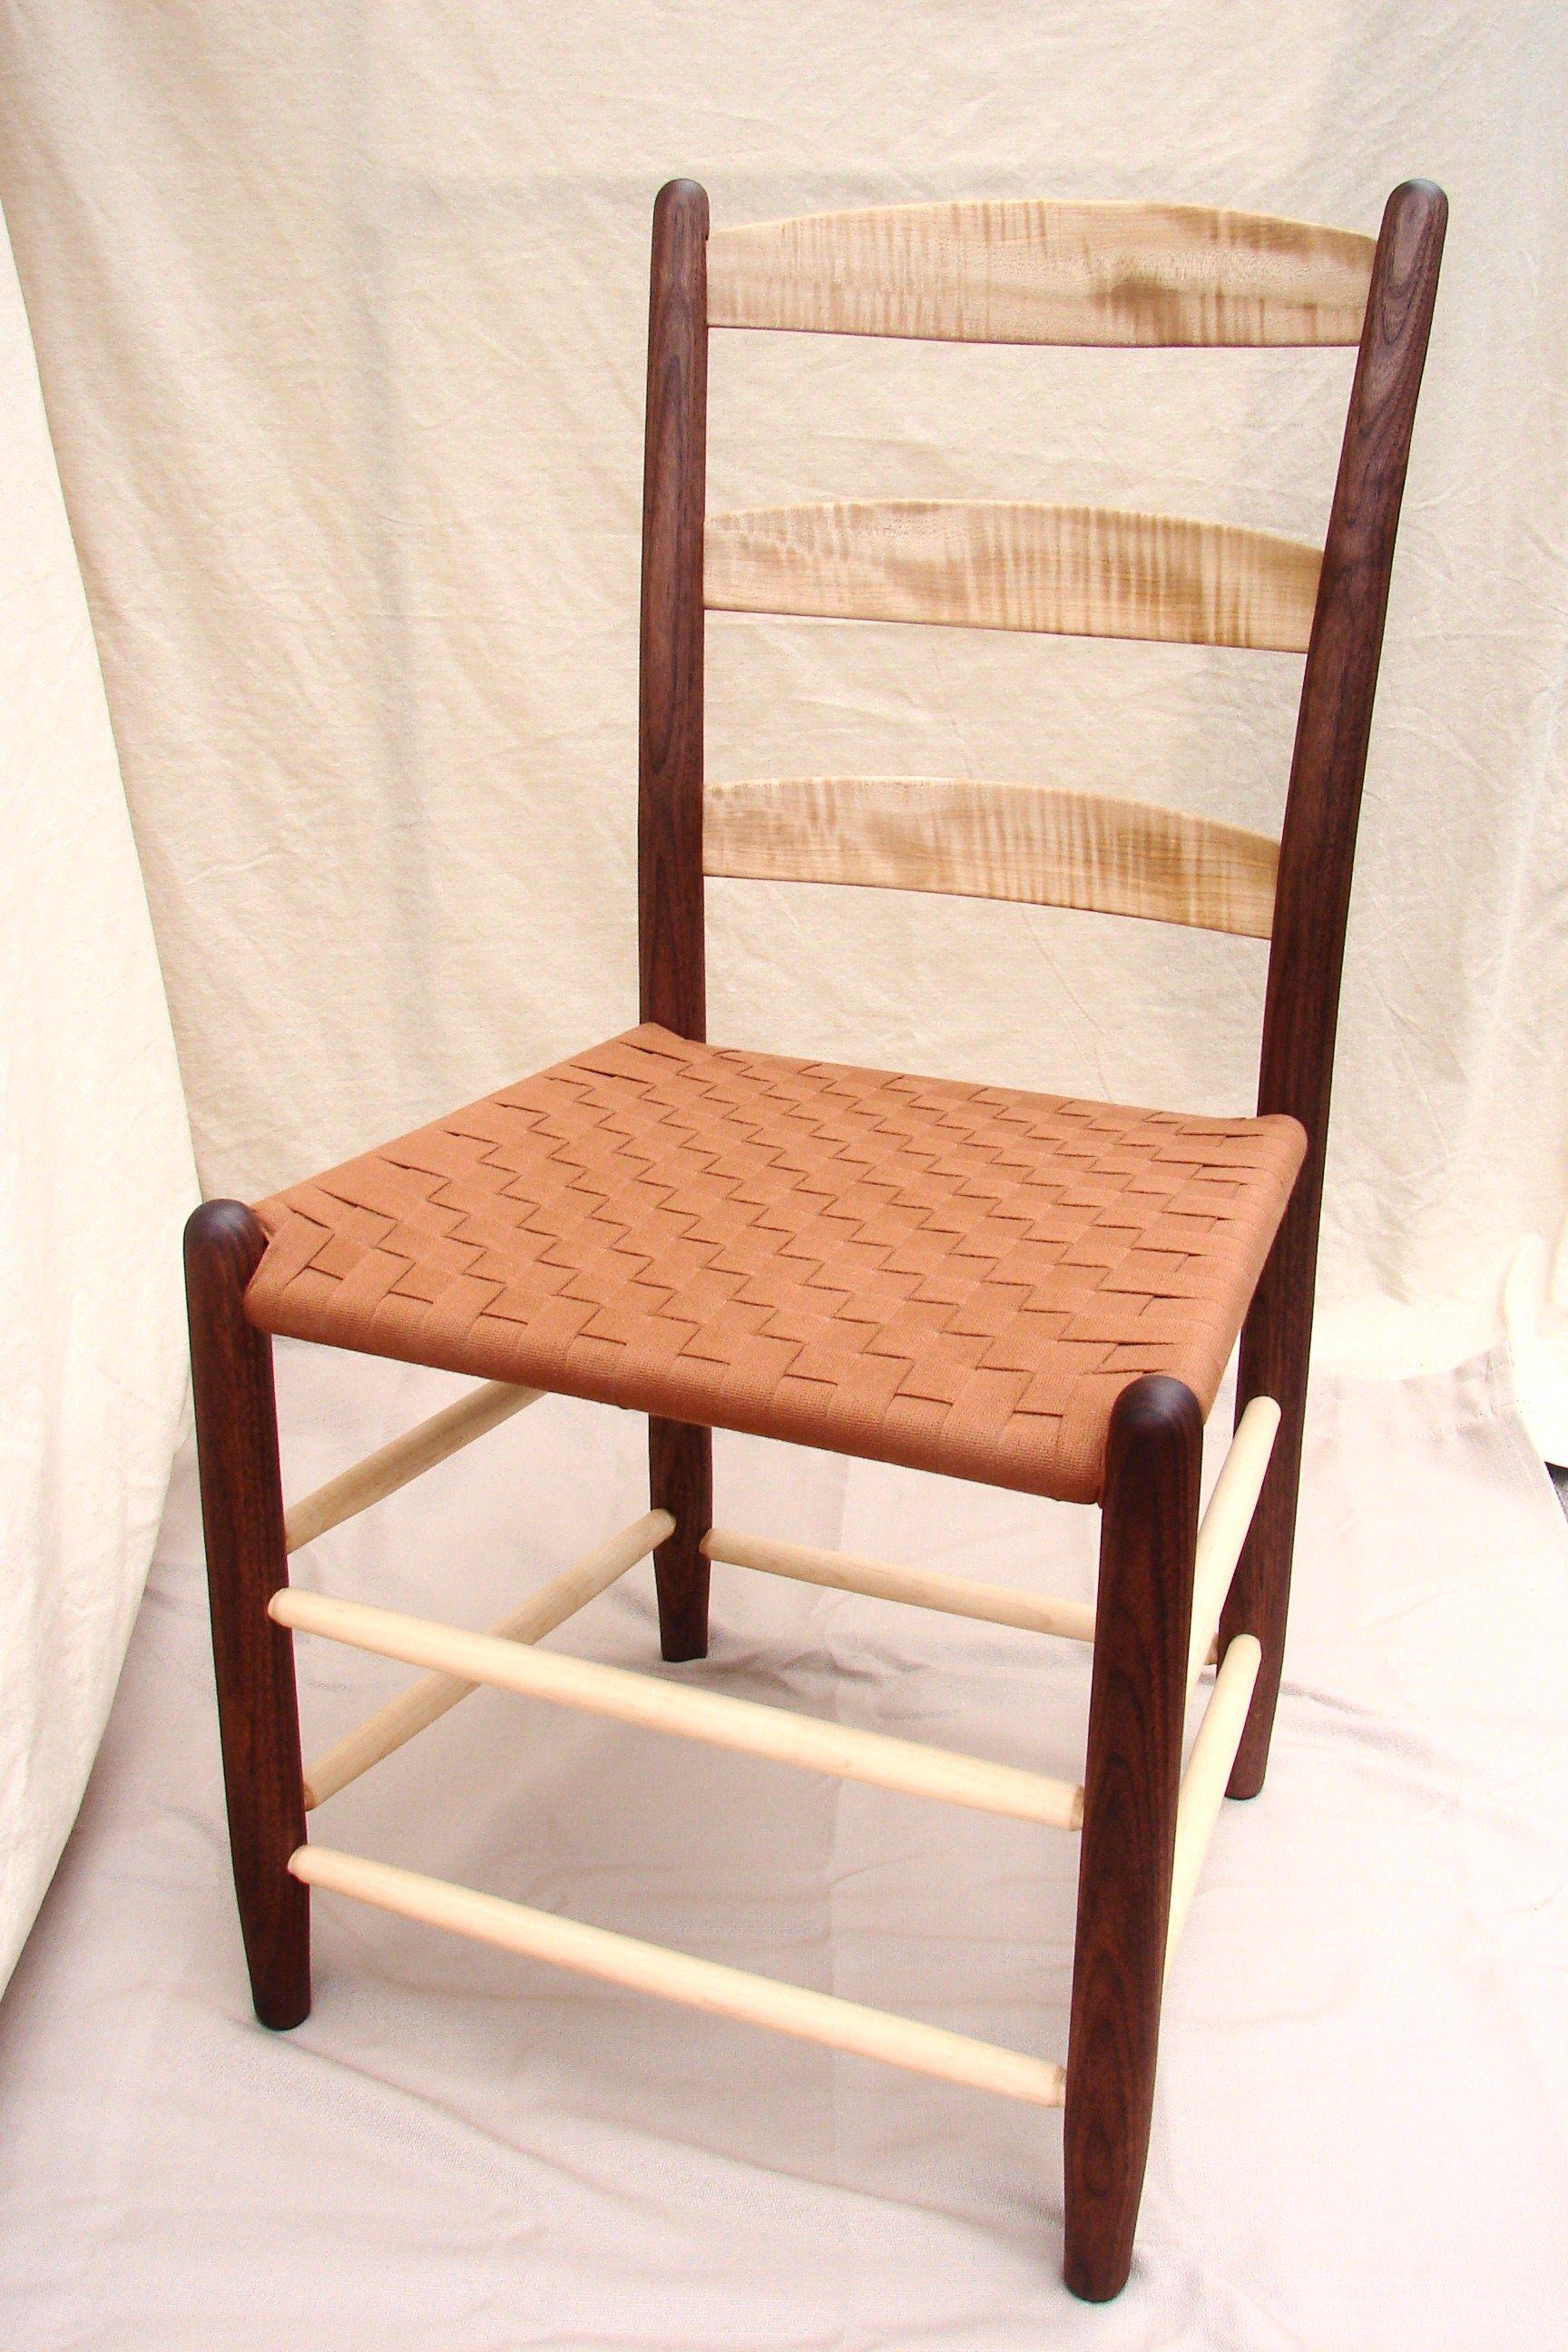 Our Three Slat Tappan Side Chair Featuring Regional Black Walnut